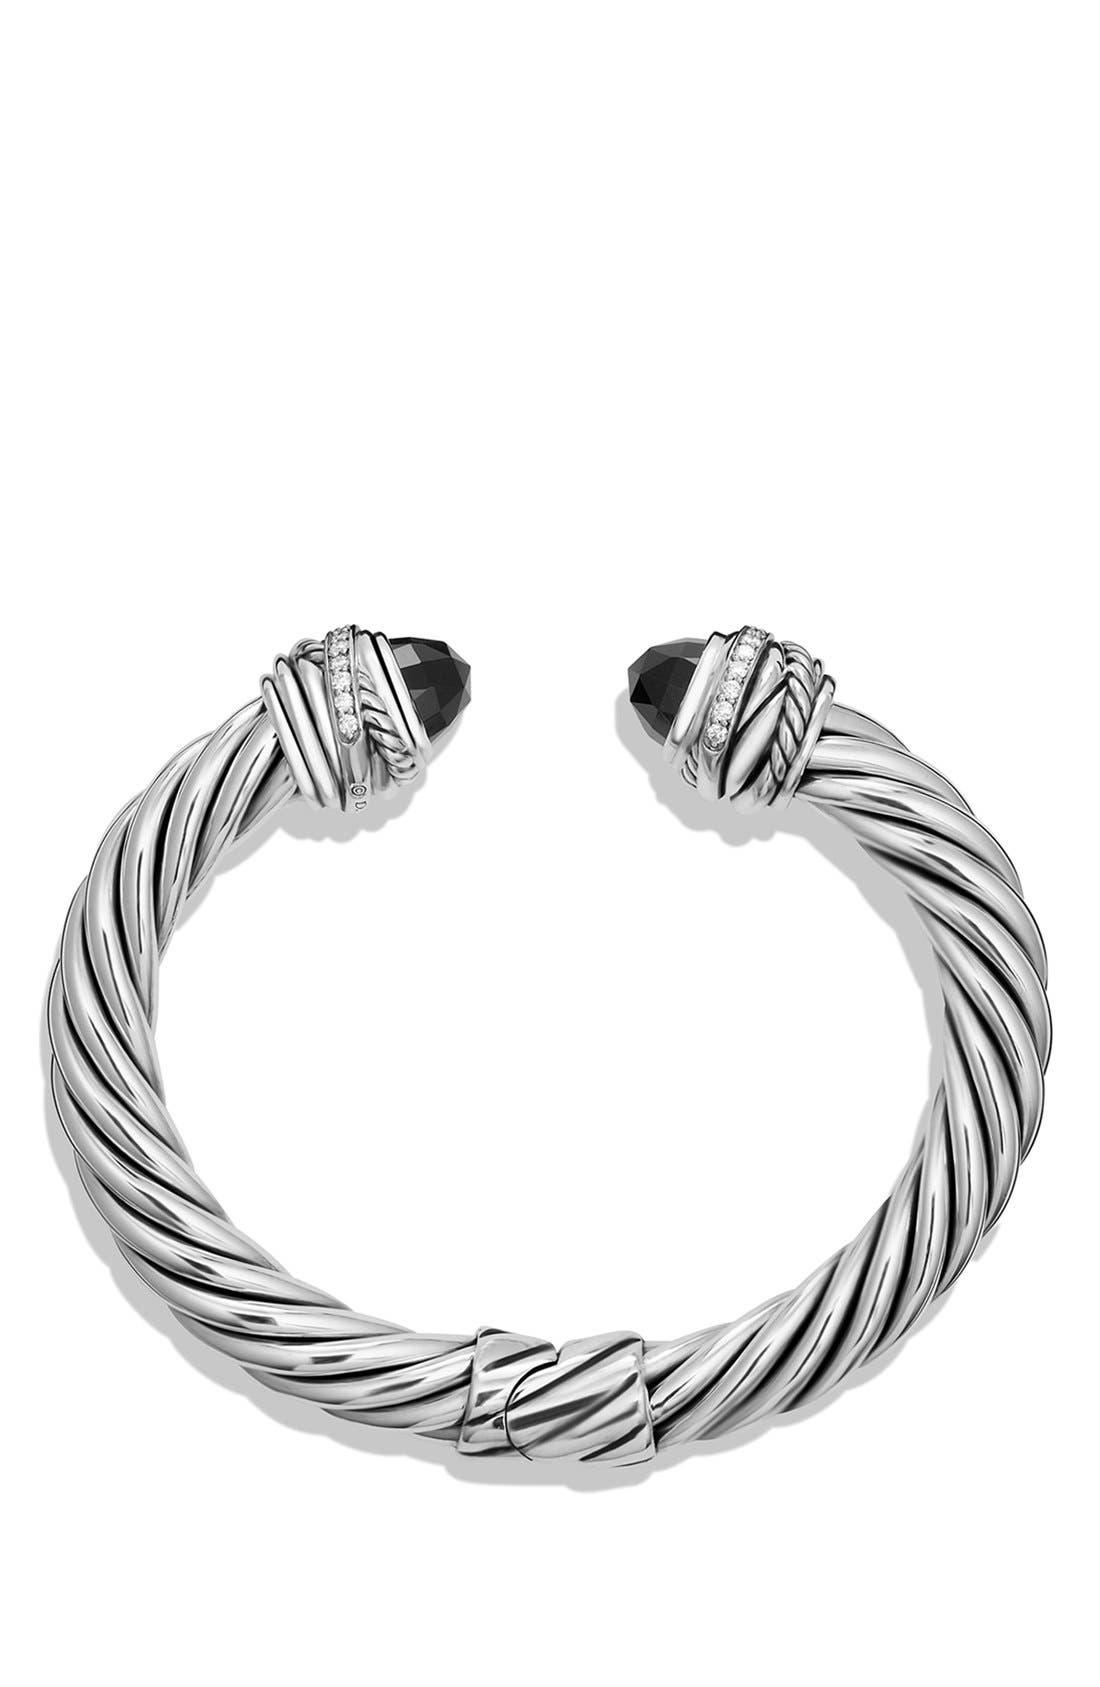 'Cable Classics' Bracelet with Semiprecious Stones & Diamonds,                             Alternate thumbnail 2, color,                             001